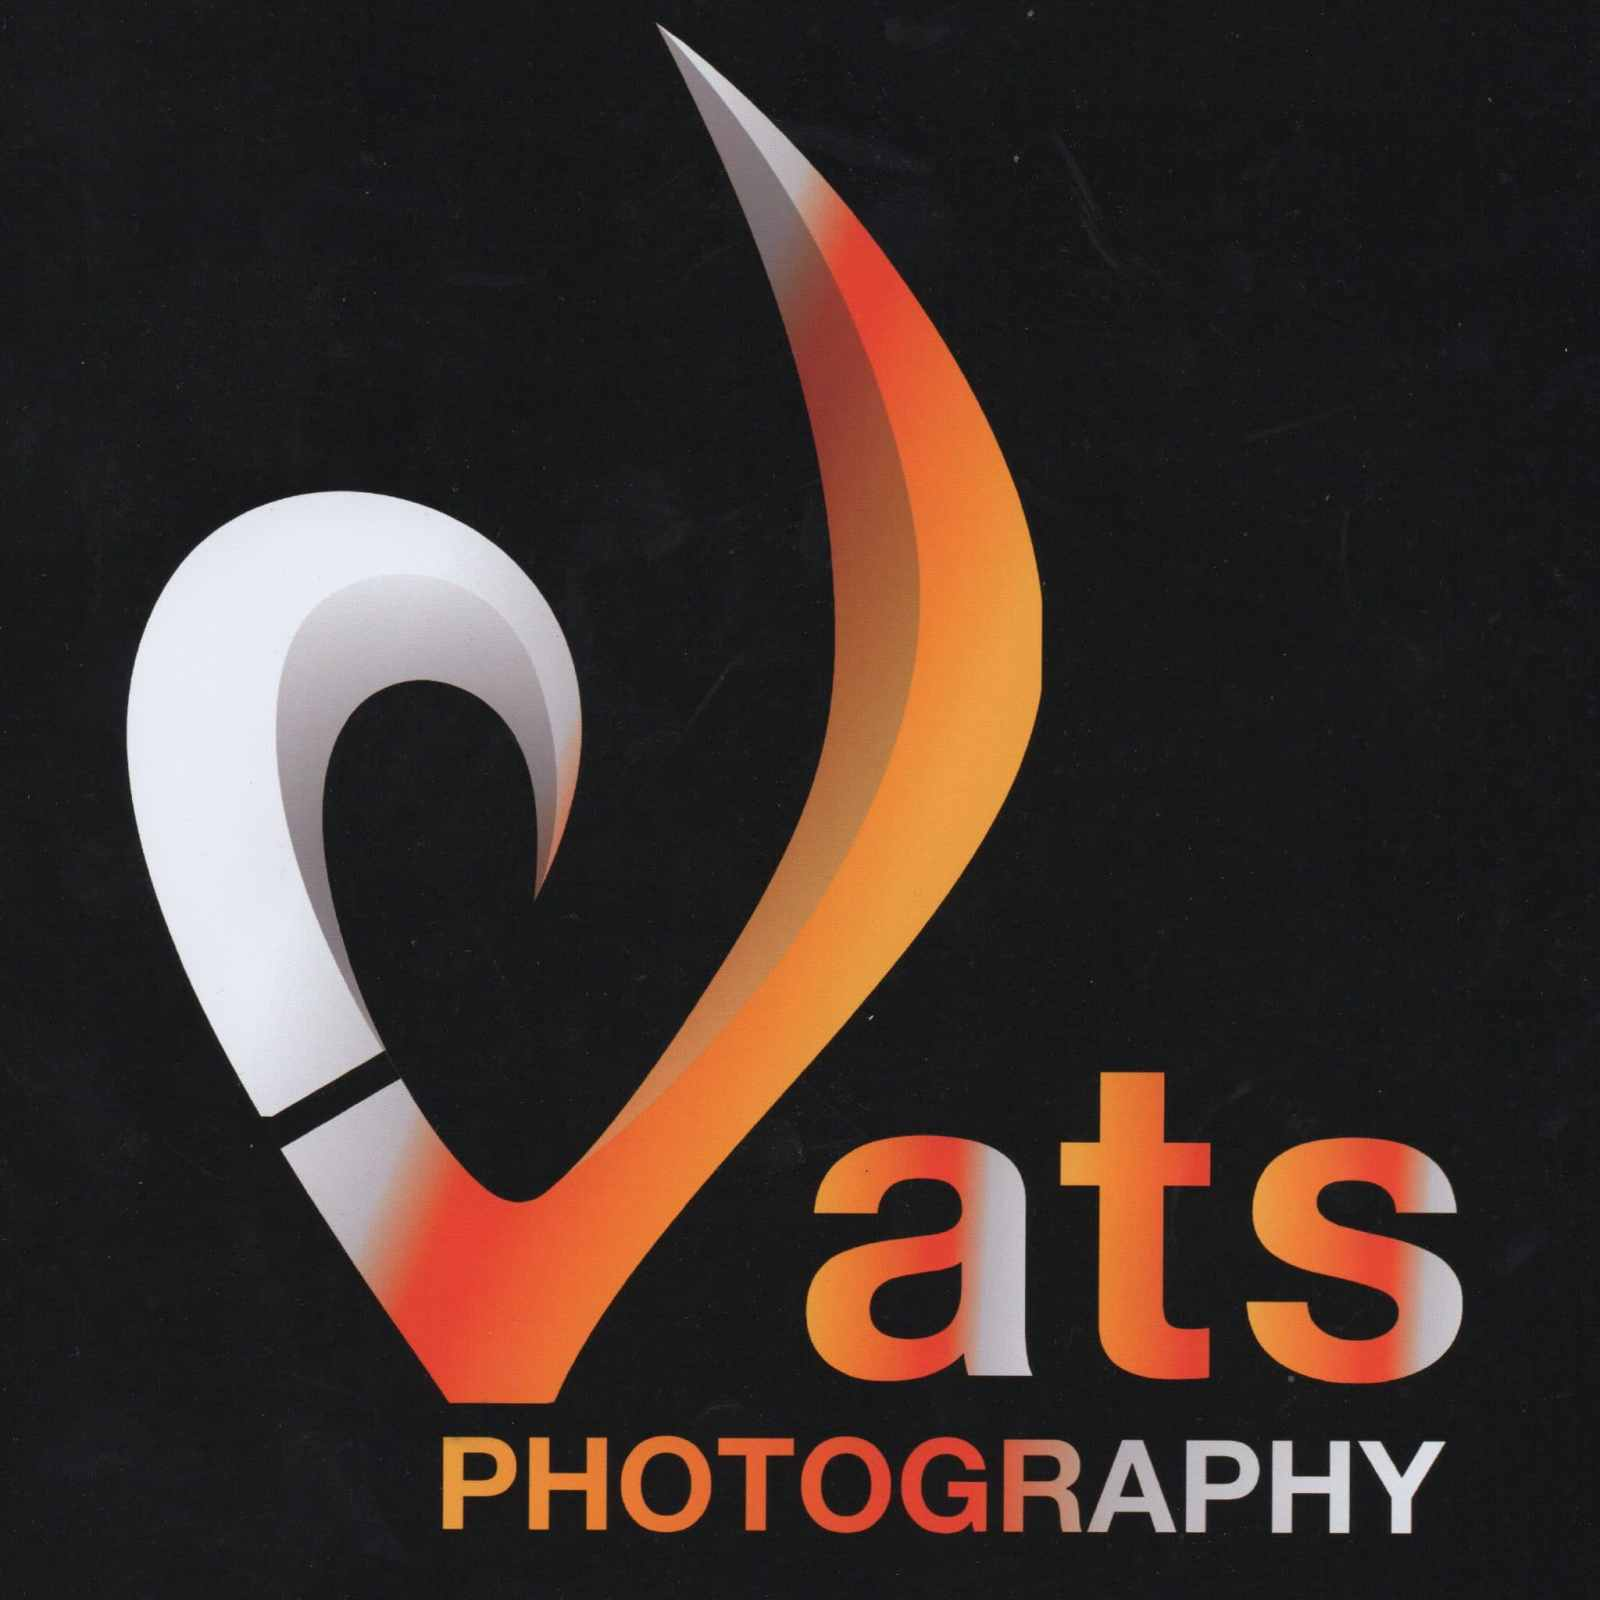 vatsphotography feat